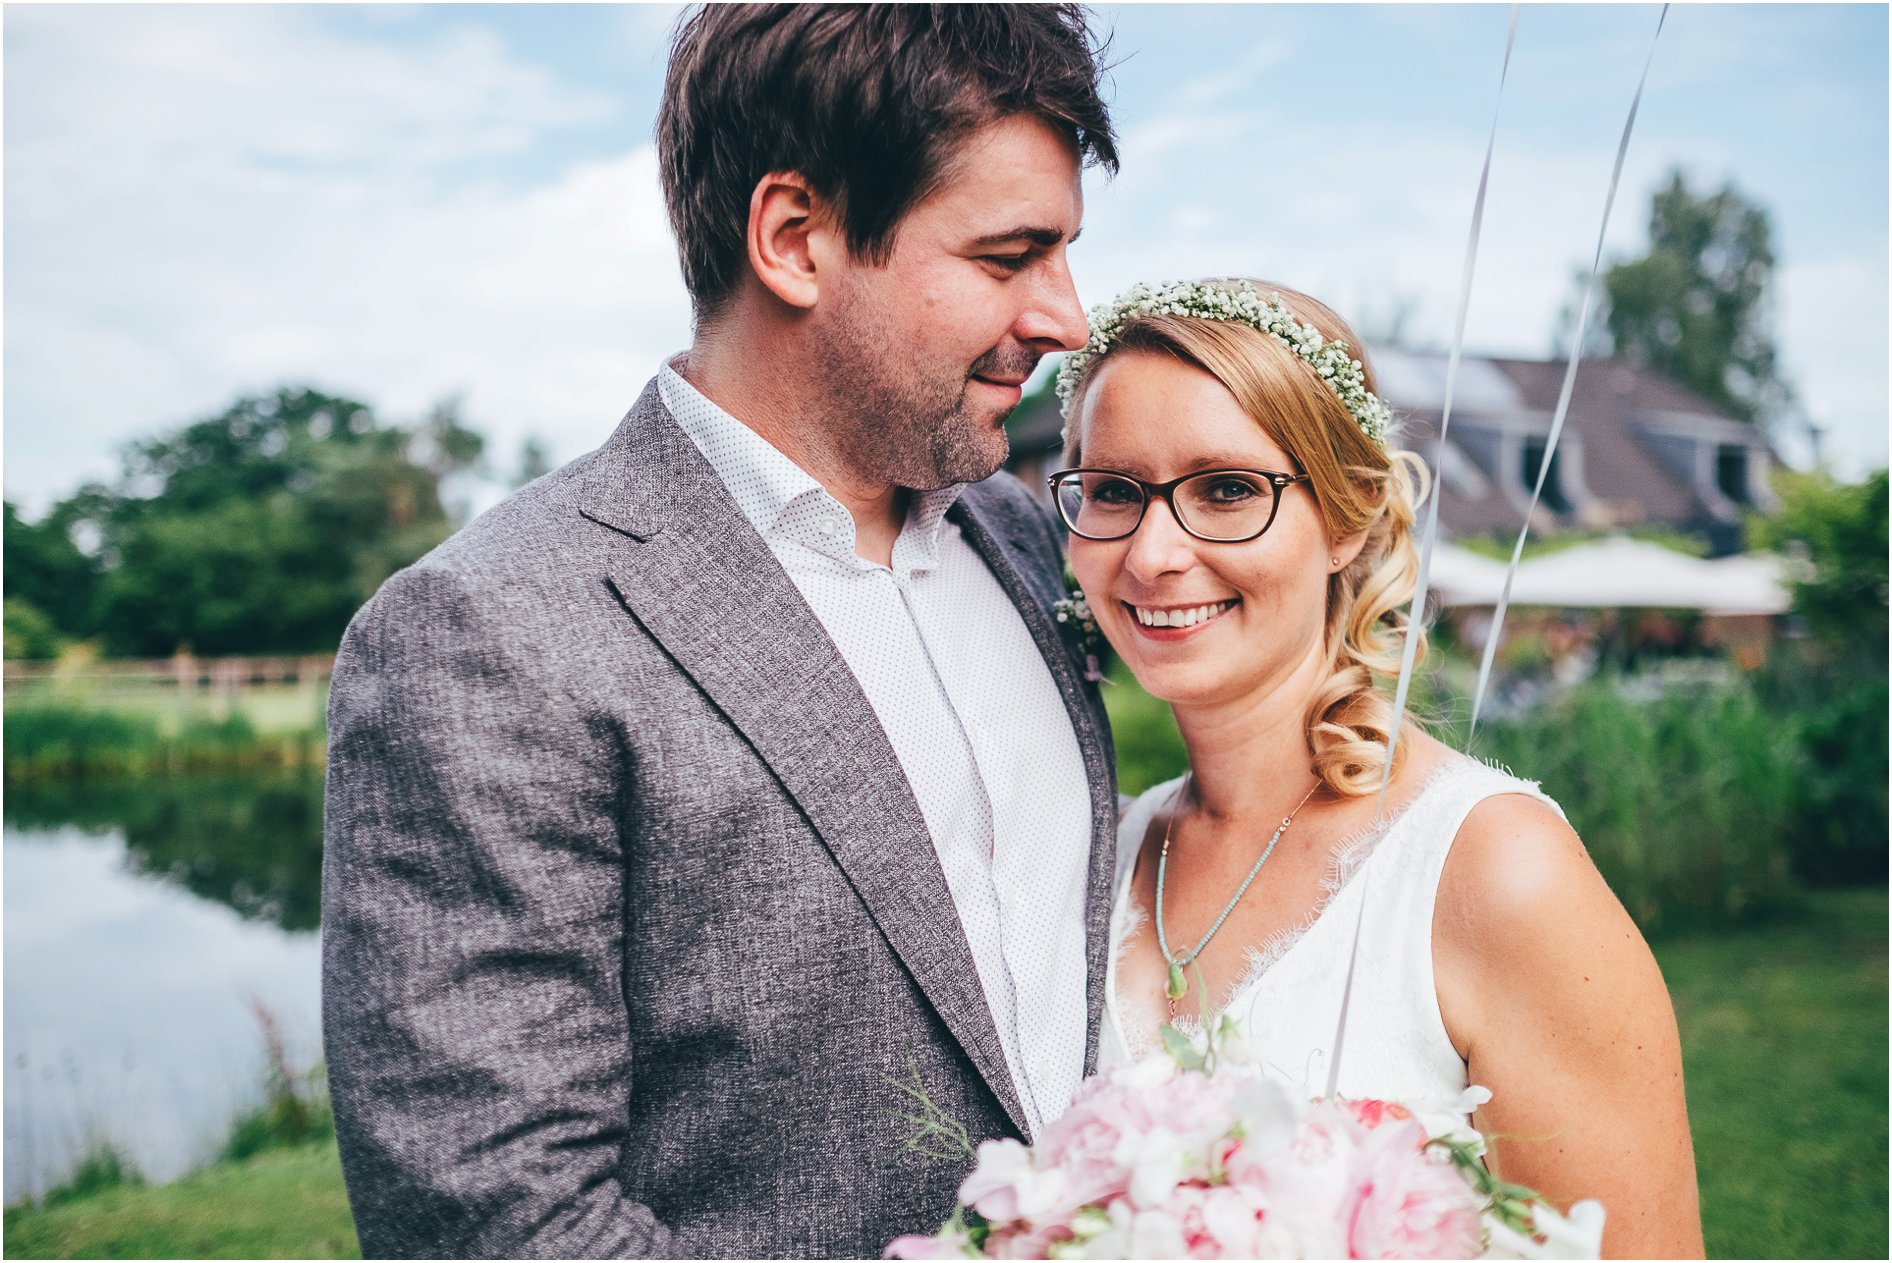 2016-04-19_0055 Sandra & Janis - Hochzeitsfotograf in Seevetal